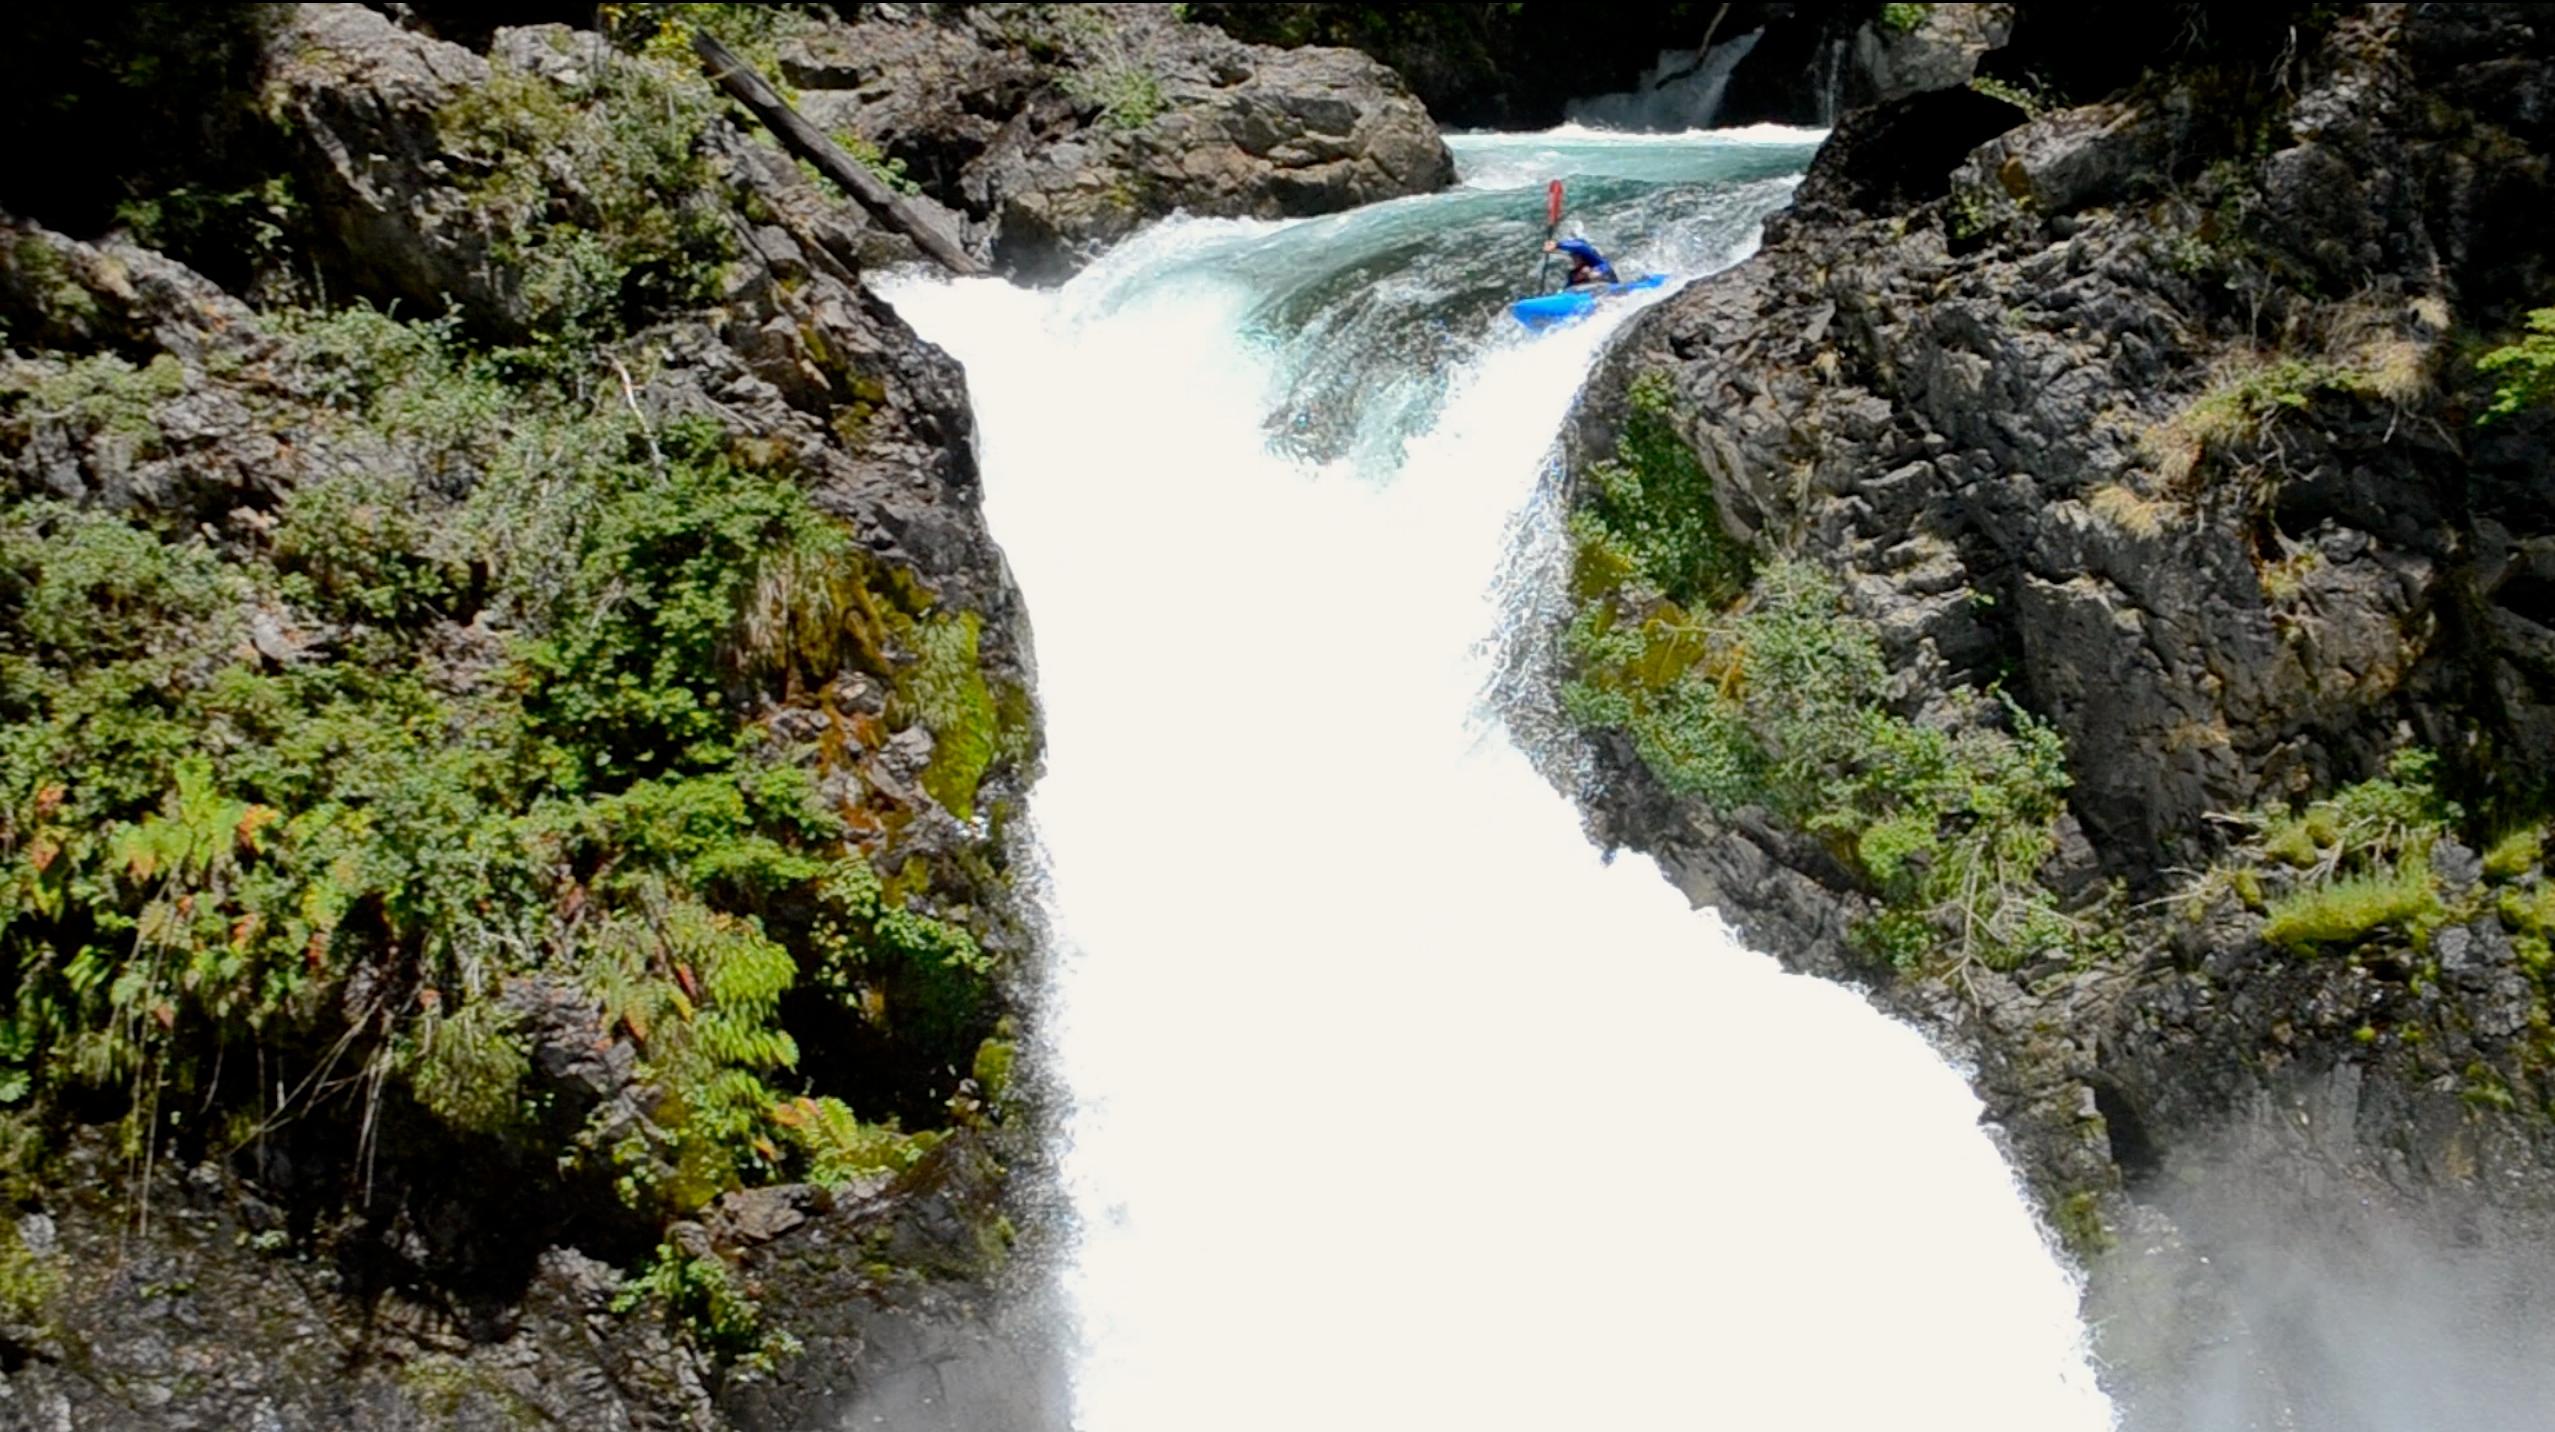 Salto Alerces! One of my favorite waterfalls